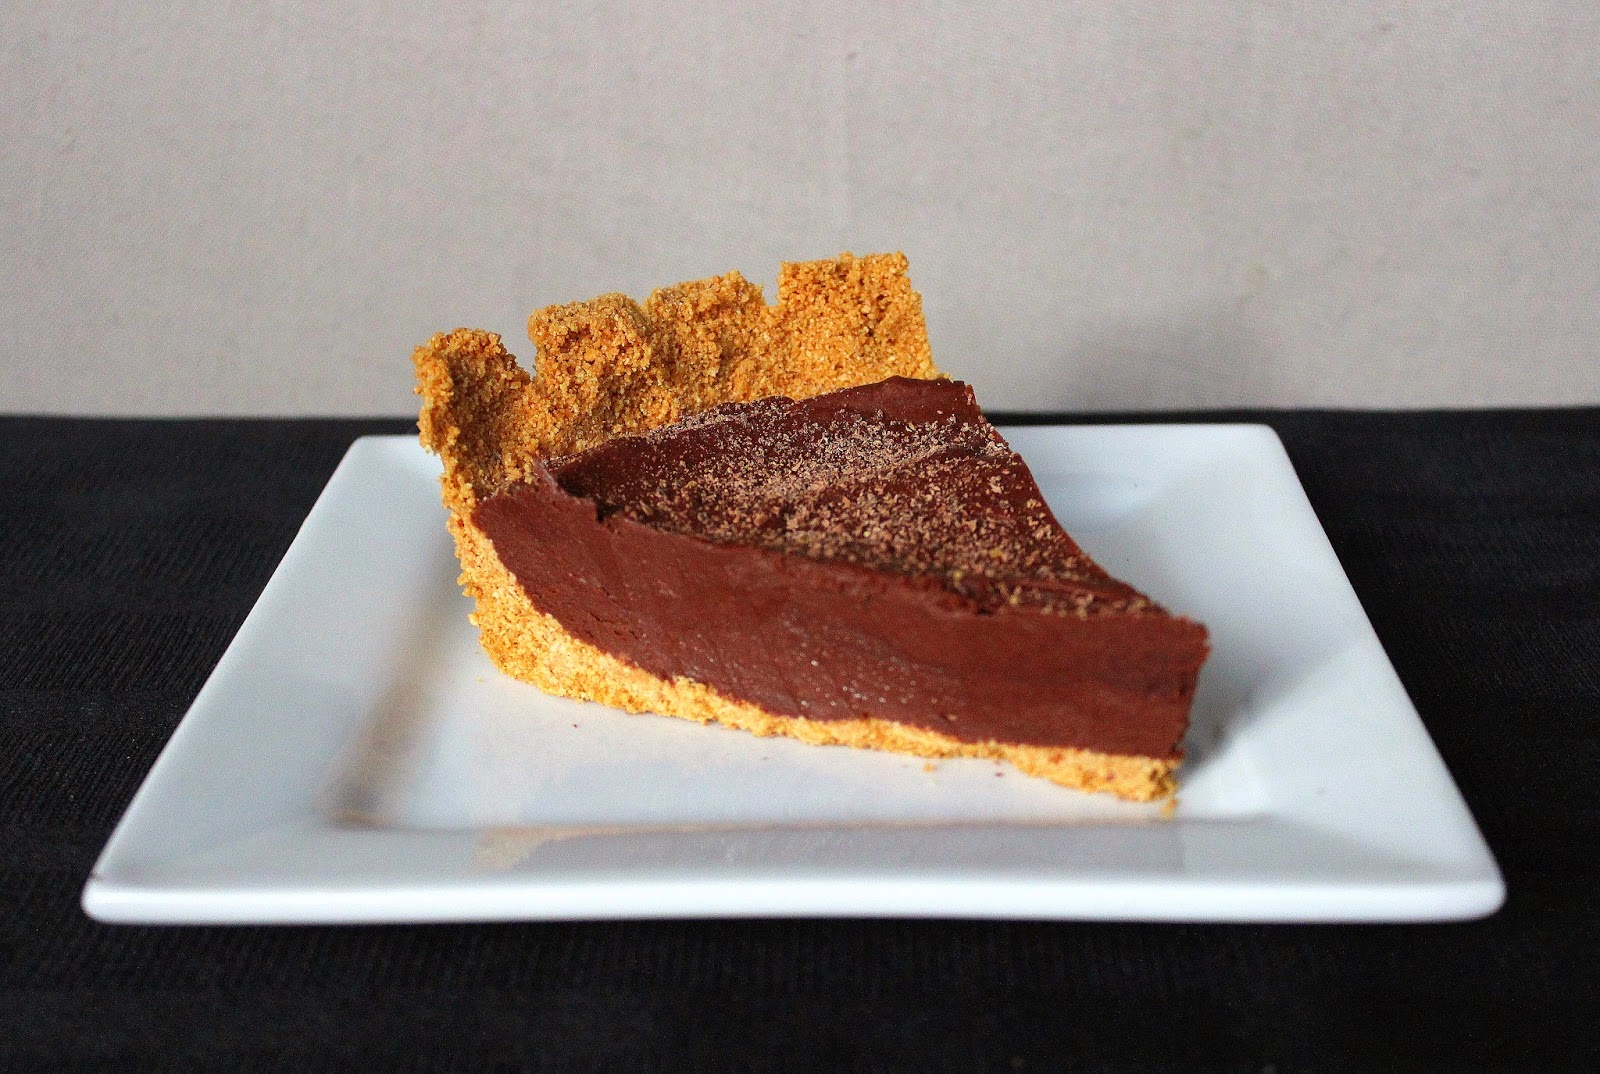 PicNic: Chocolate Mousse Pie